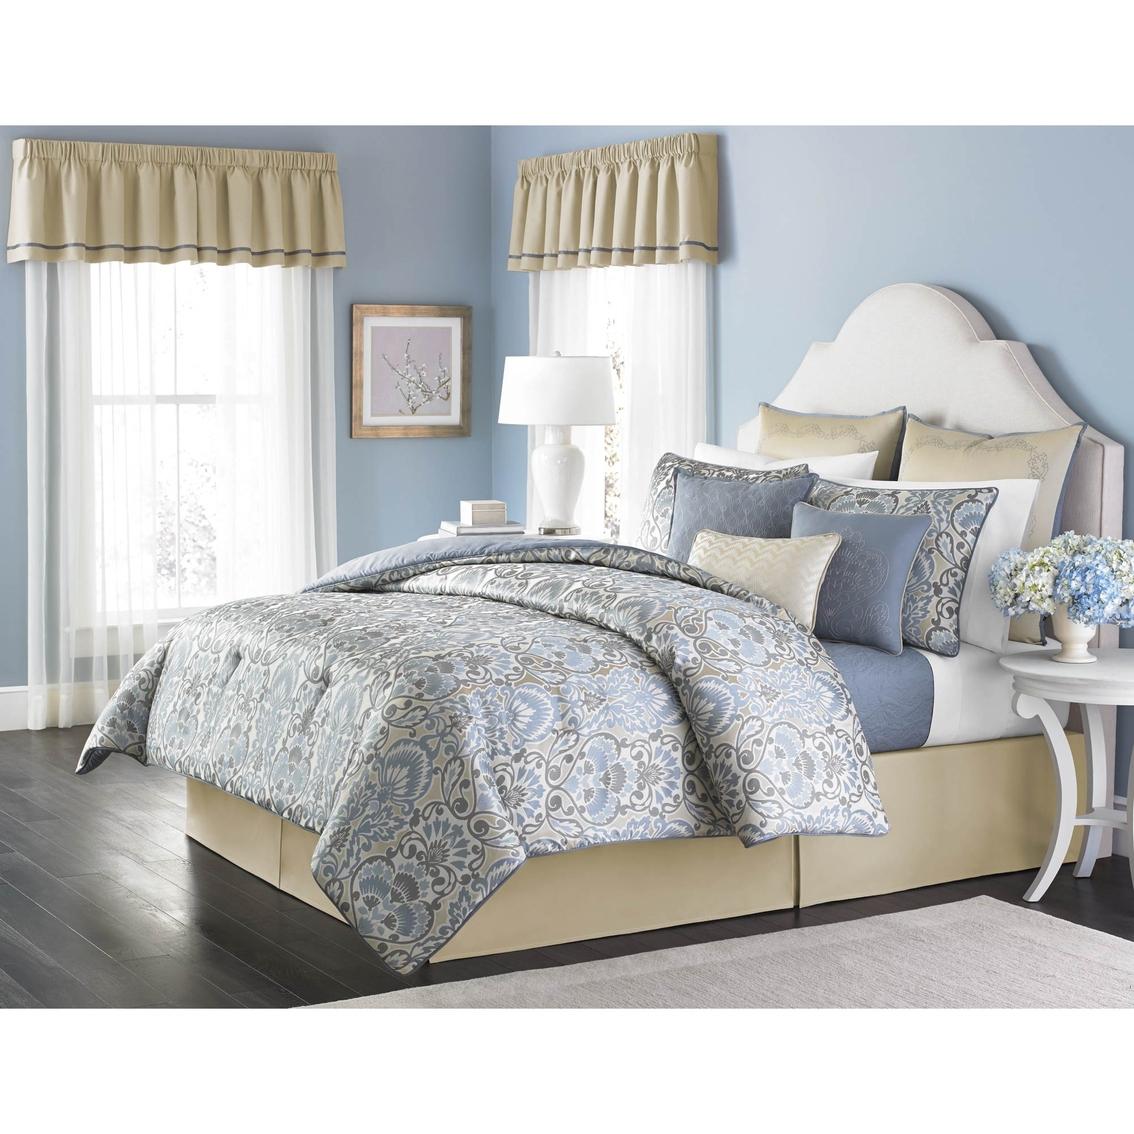 Martha Stewart Bed Sets Martha Stewart Collection Garden Retreat 9 Comforter Sets Available At